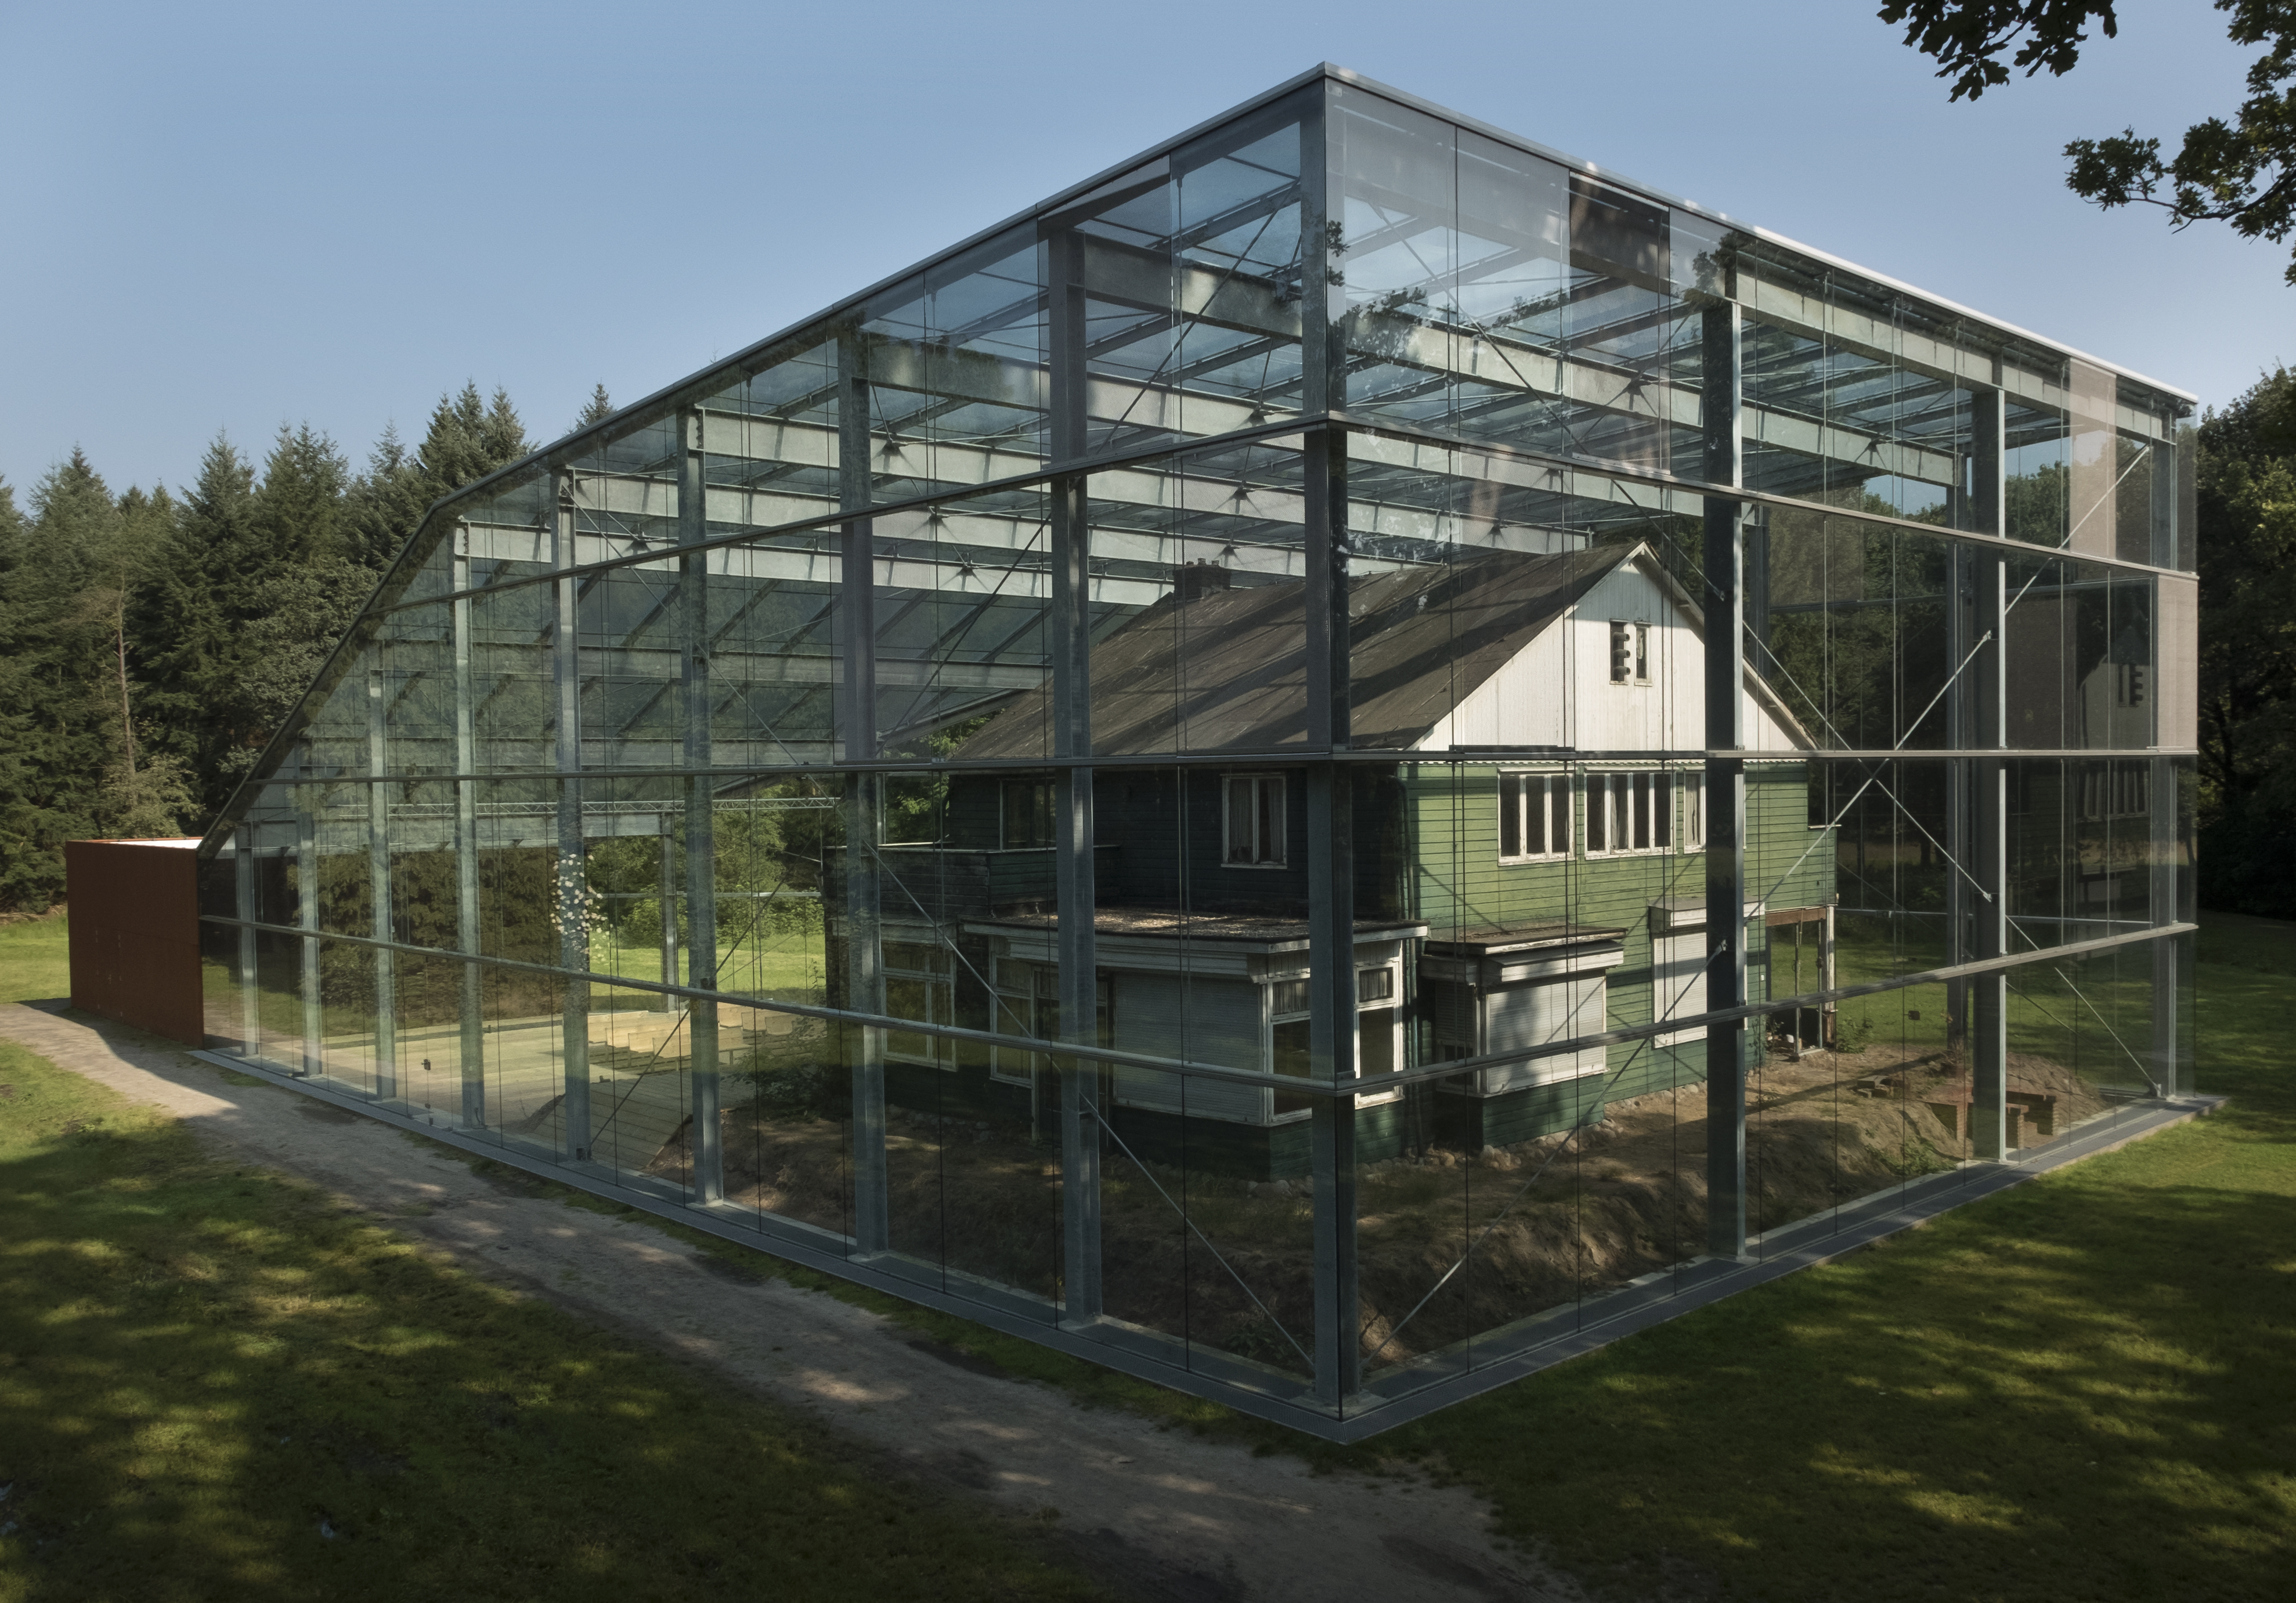 Nederland - Hooghalen - Drenthe - 06-09-2016 Herinneringscentrum voormalig kamp Westerbork. Commandantswoning. Foto: Sake Elzinga